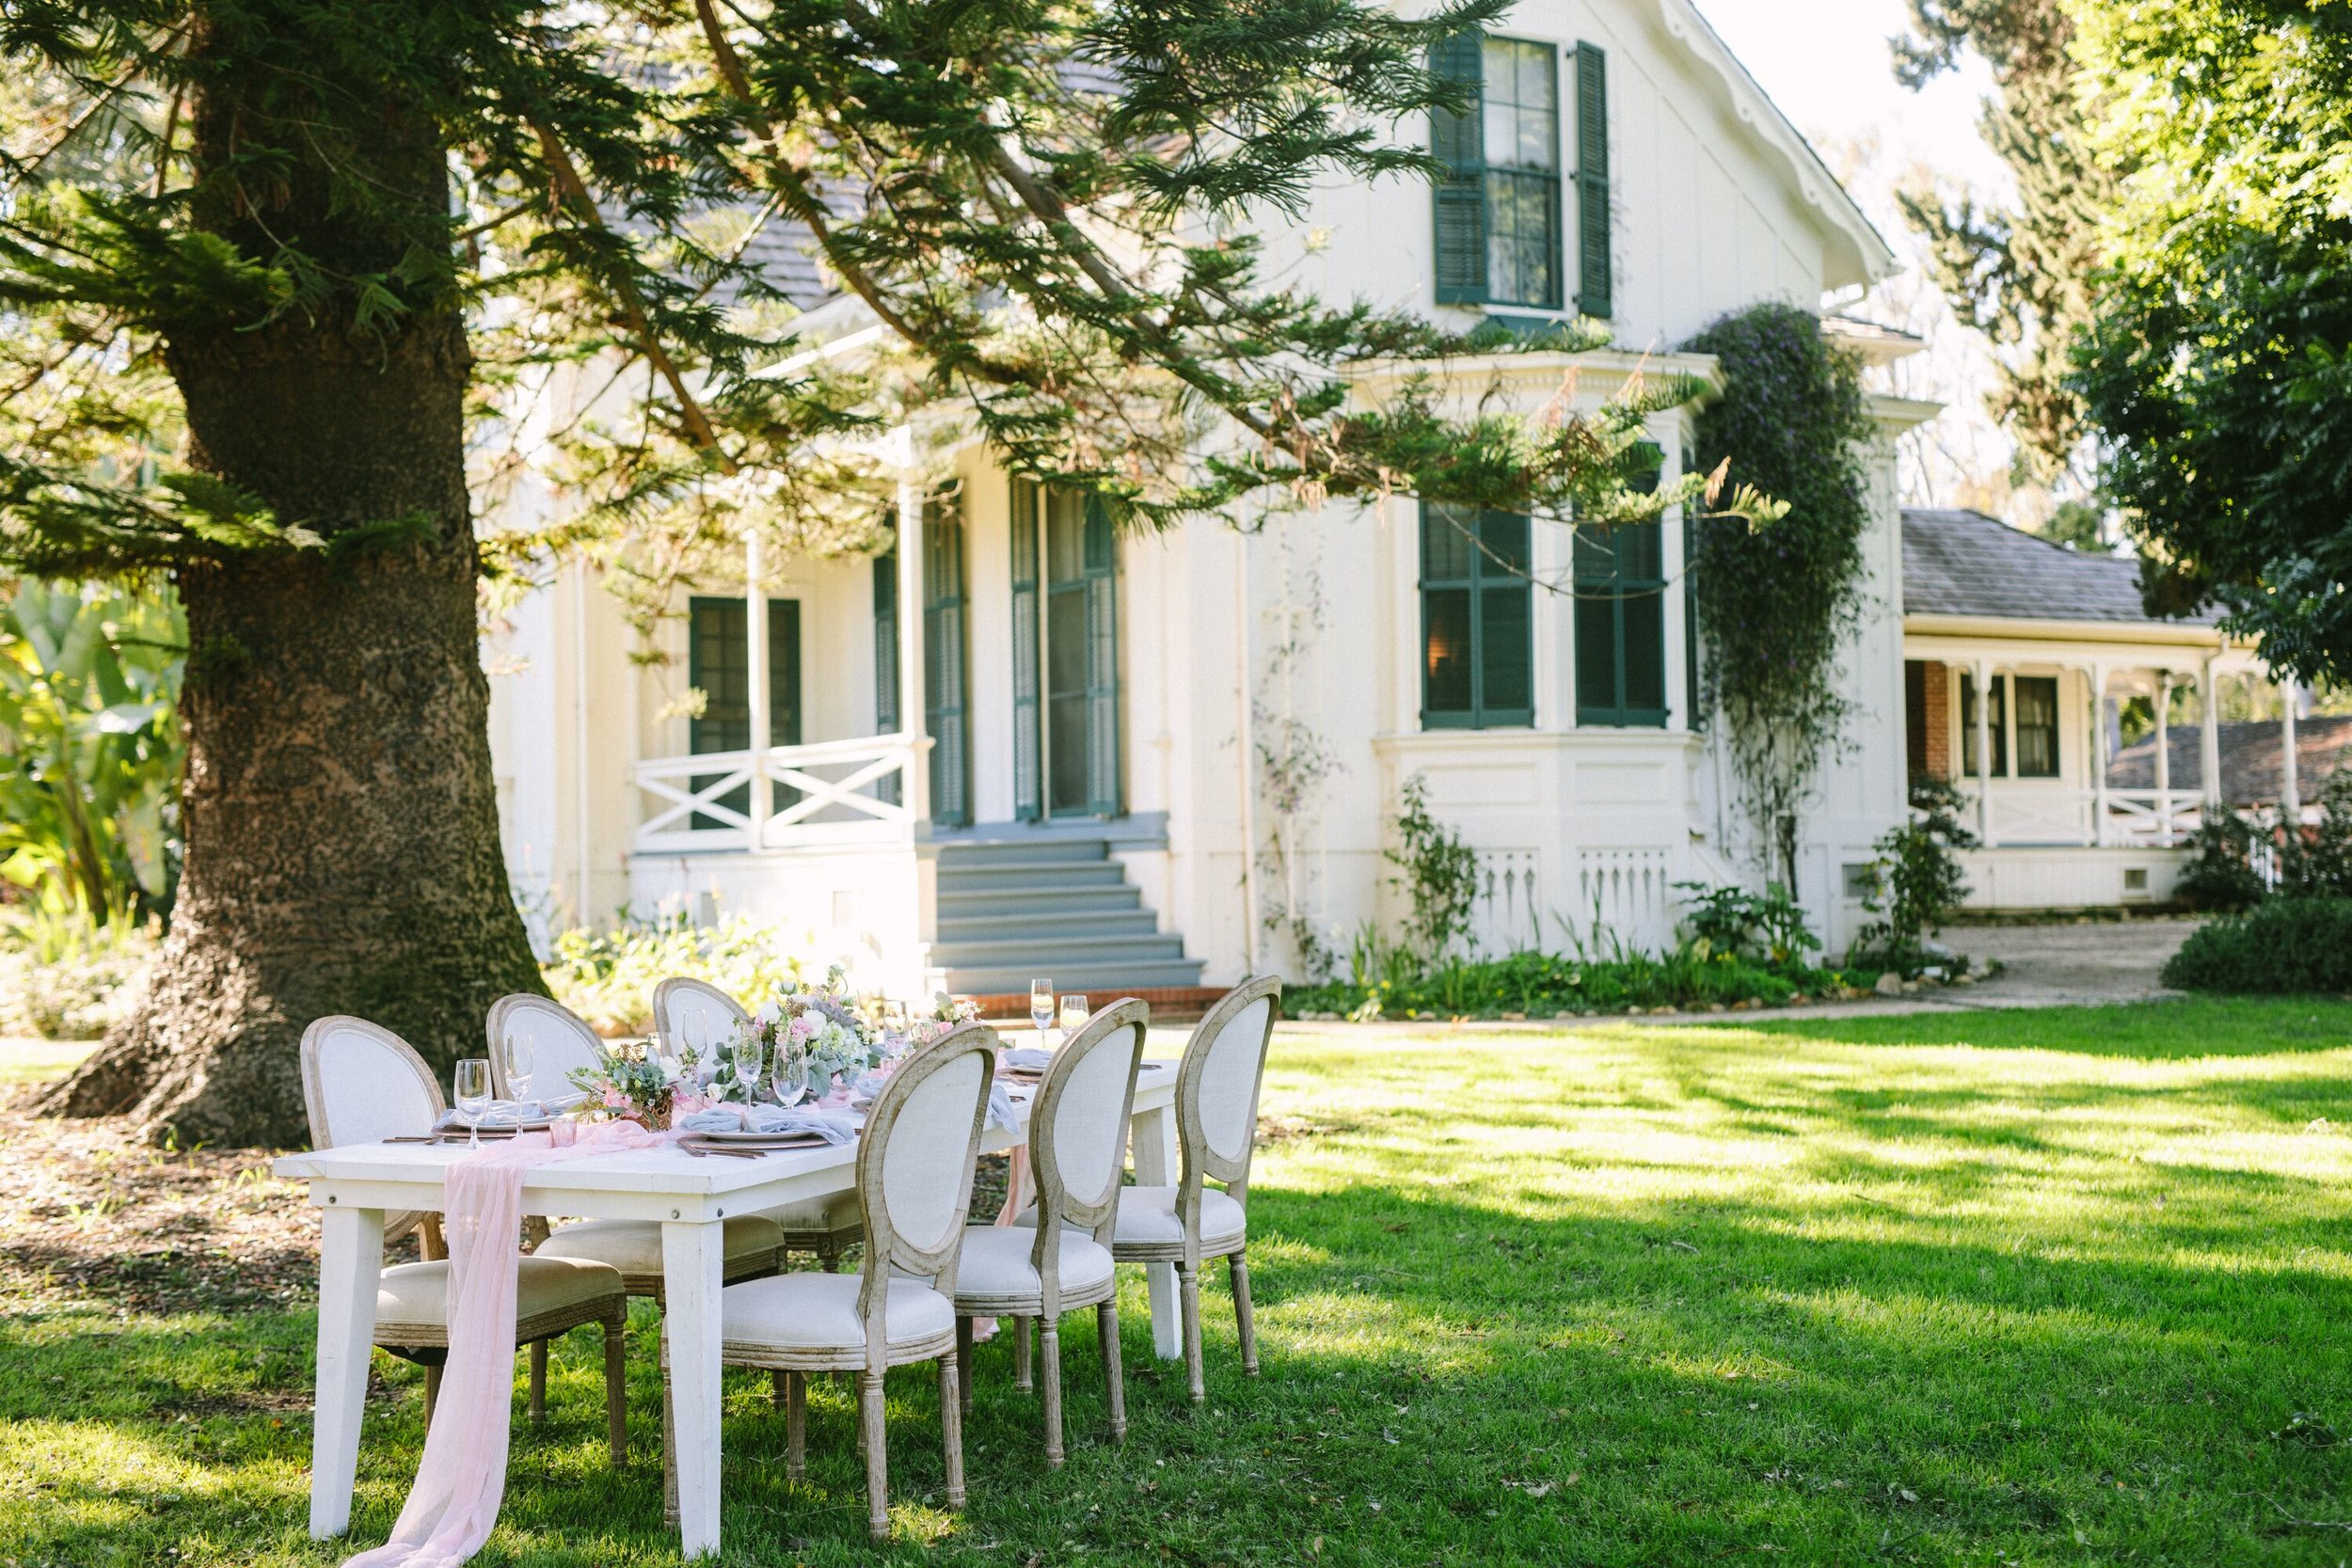 www.santabarbarawedding.com | Photographer: Patrick Ang | Venue: Rancho La Patera & Stow House | Wedding Planner: Elyse Rowen of Elyse Events | Reception Site